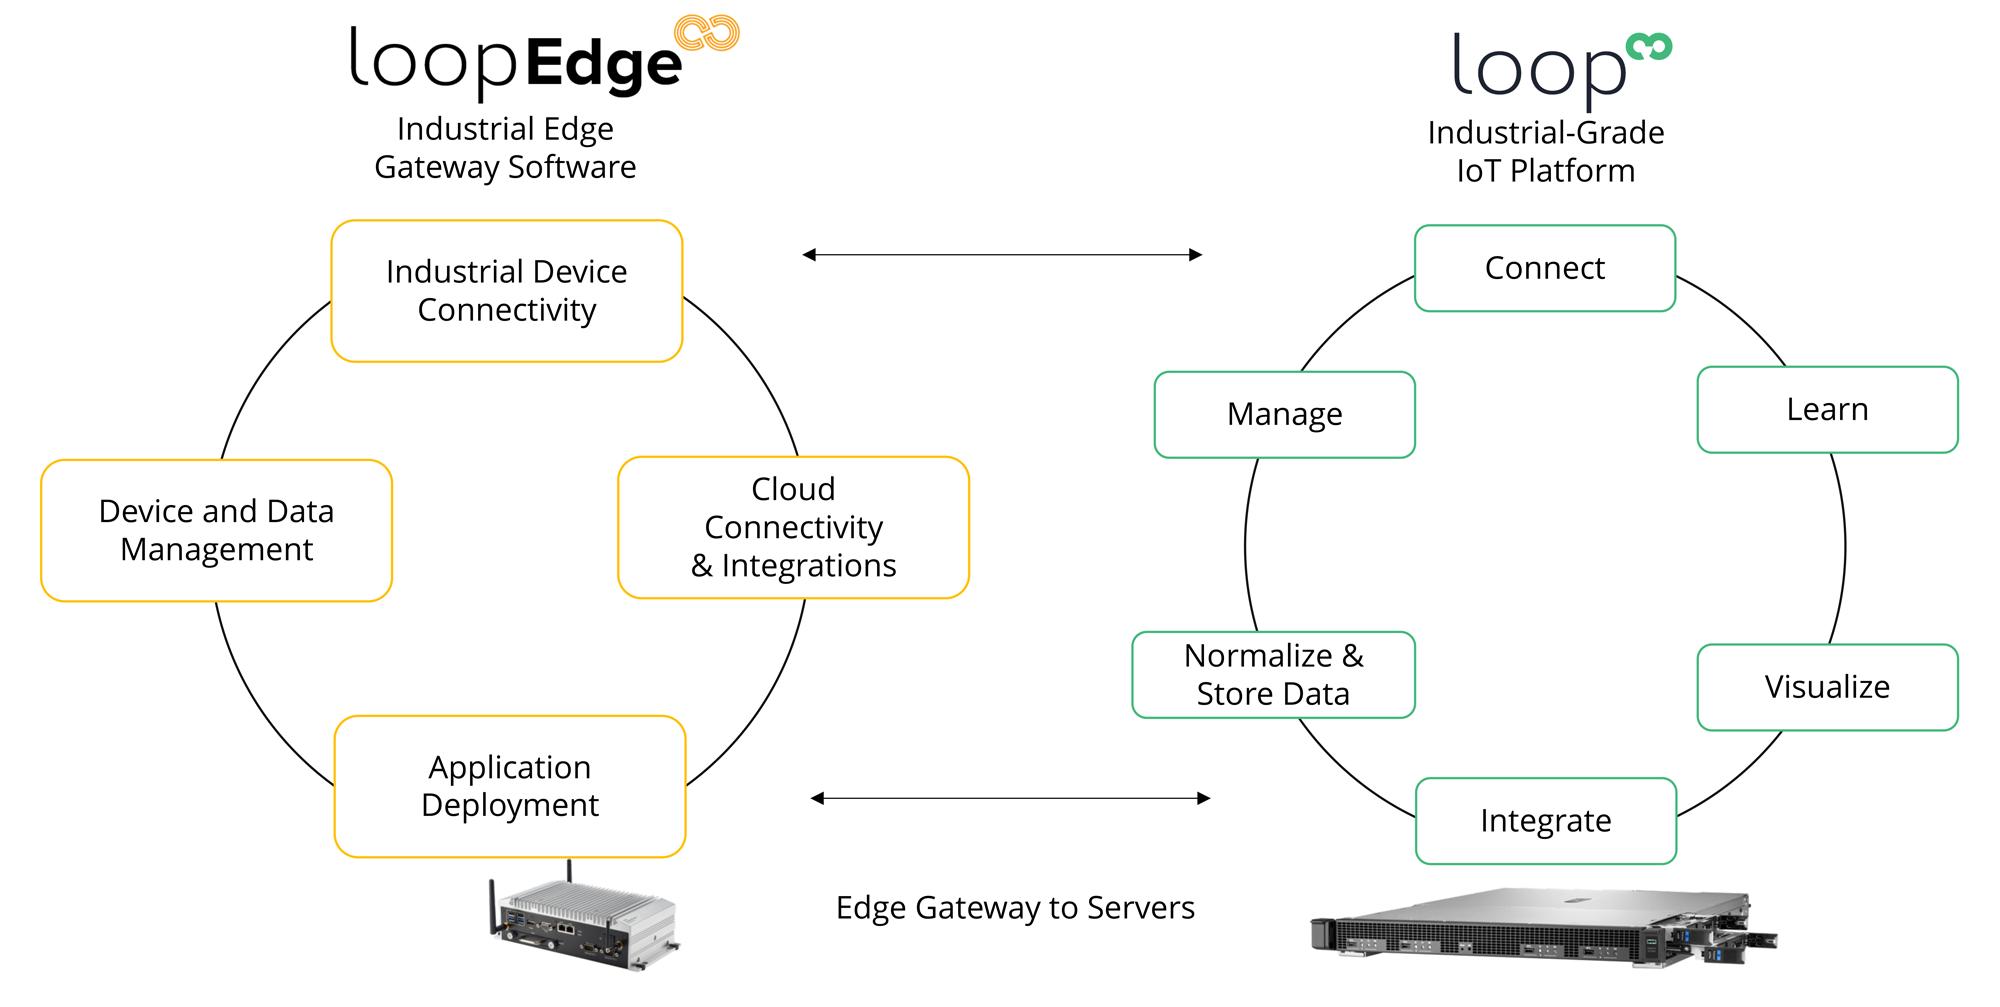 Litmus Automation 解決方案提供順暢無礙的邊緣運算和雲端管理